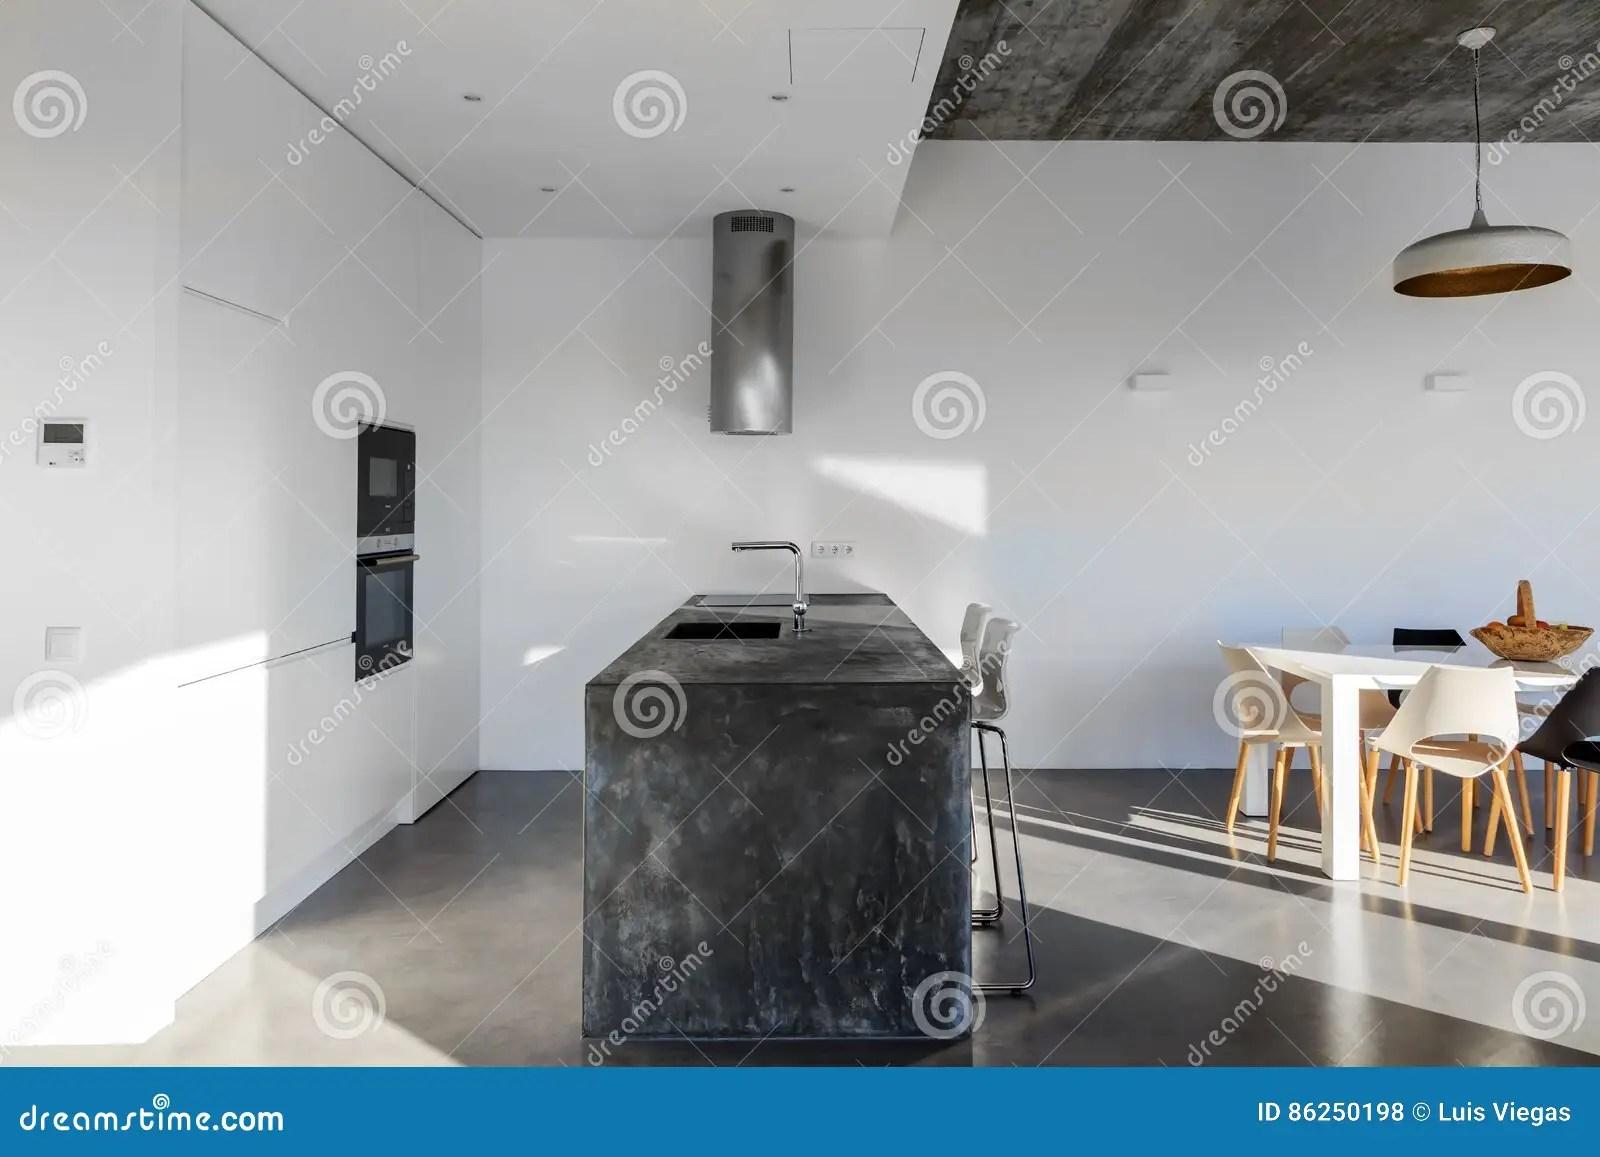 Piastrelle cucina moderna bianca e grigia piastrelle cucina idee